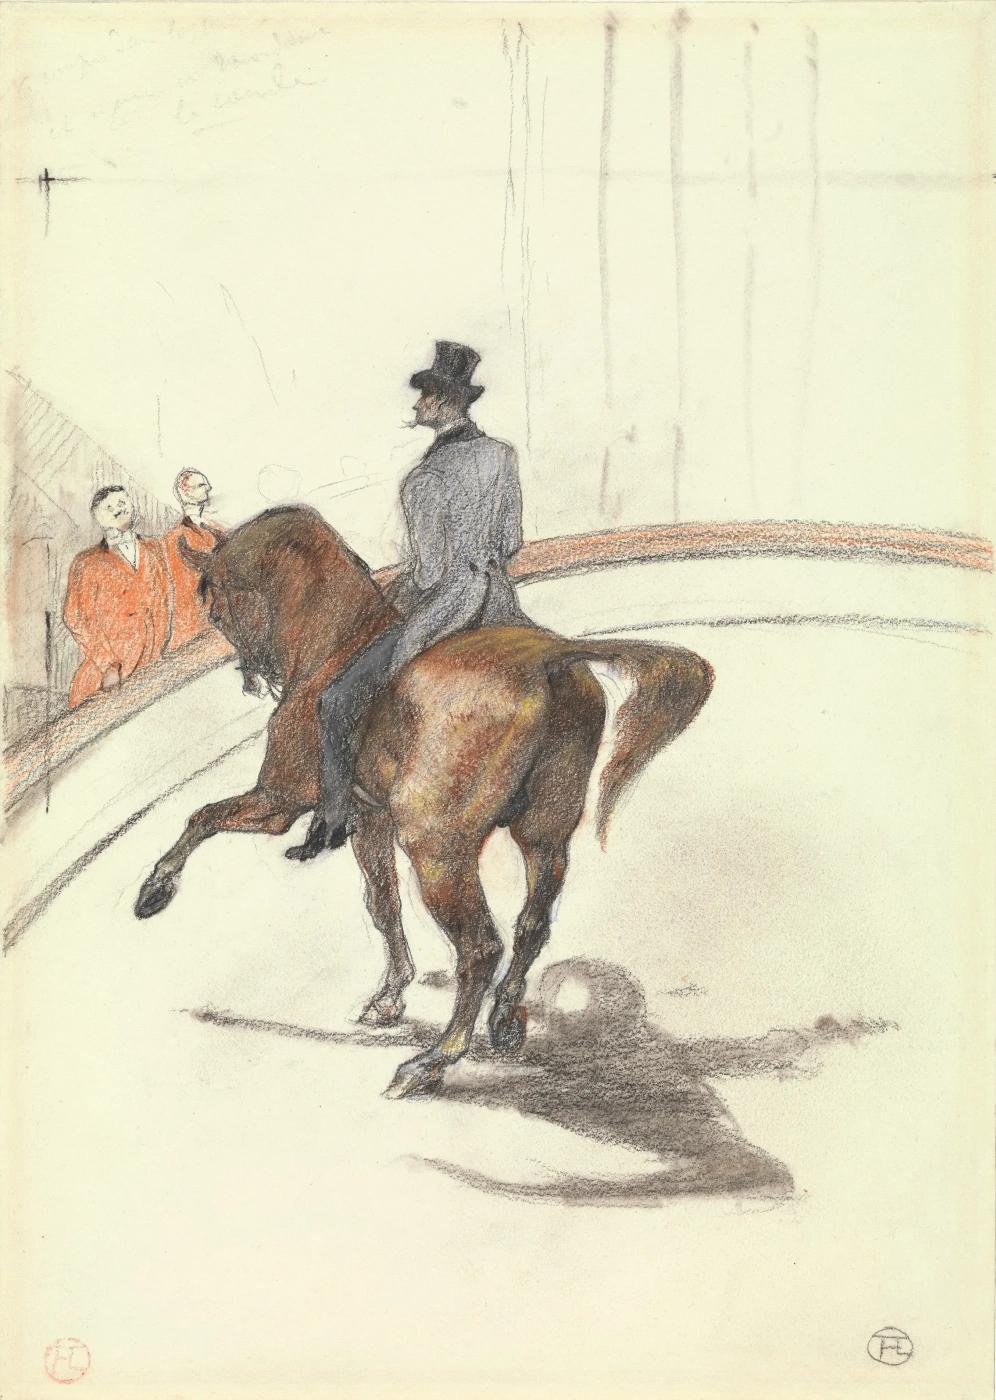 В цирке. Испанская прогулка Анри де Тулуз-Лотрек Графика, 1899 г.